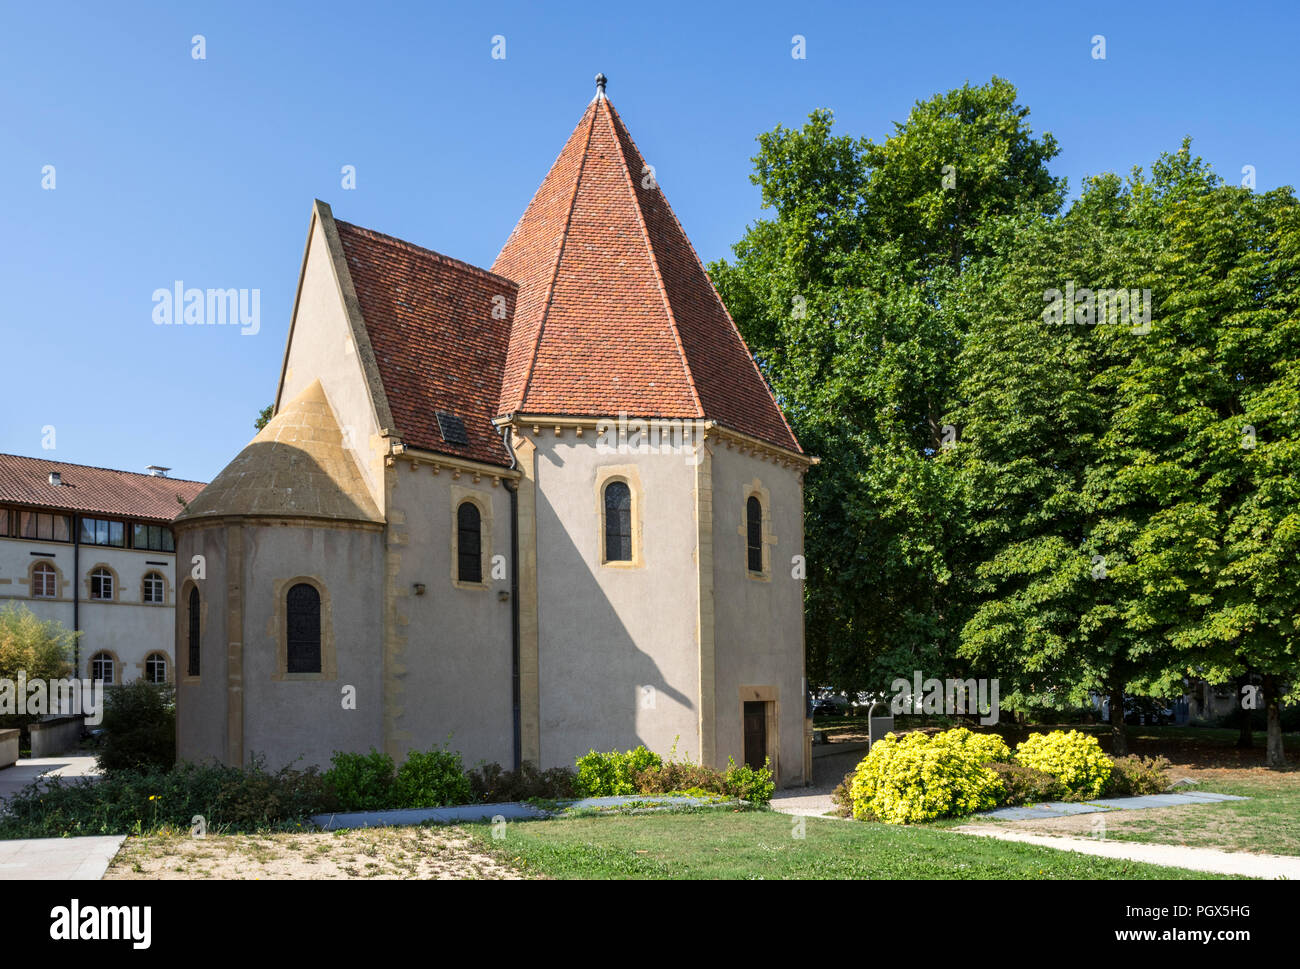 12th century Chapelle des Templiers / Templars' chapel in the city Metz, Moselle, Lorraine, France - Stock Image